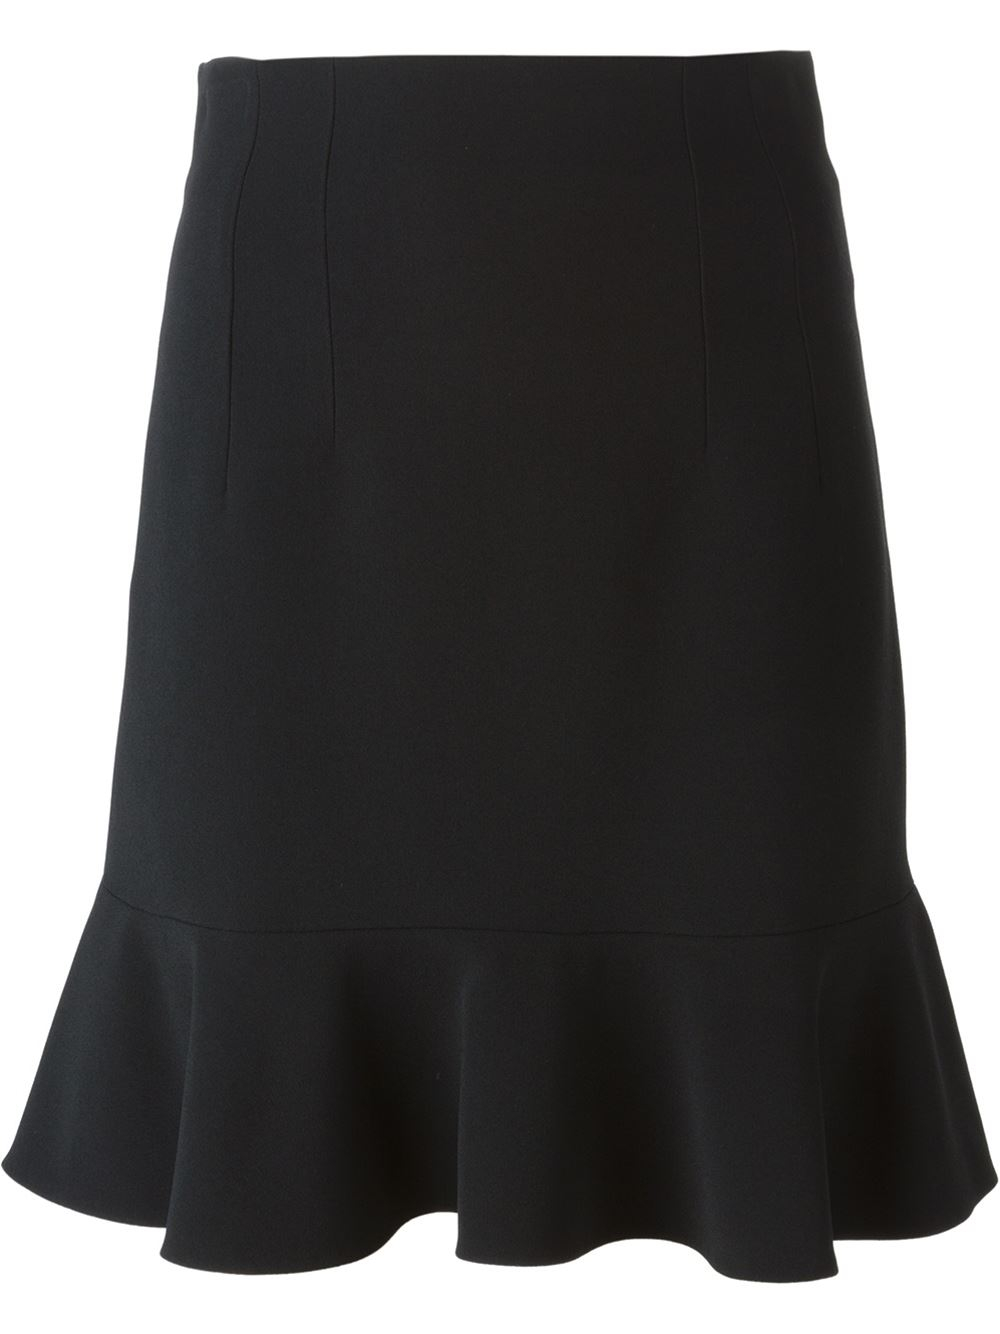 dolce gabbana ruffle hem skirt in black lyst. Black Bedroom Furniture Sets. Home Design Ideas